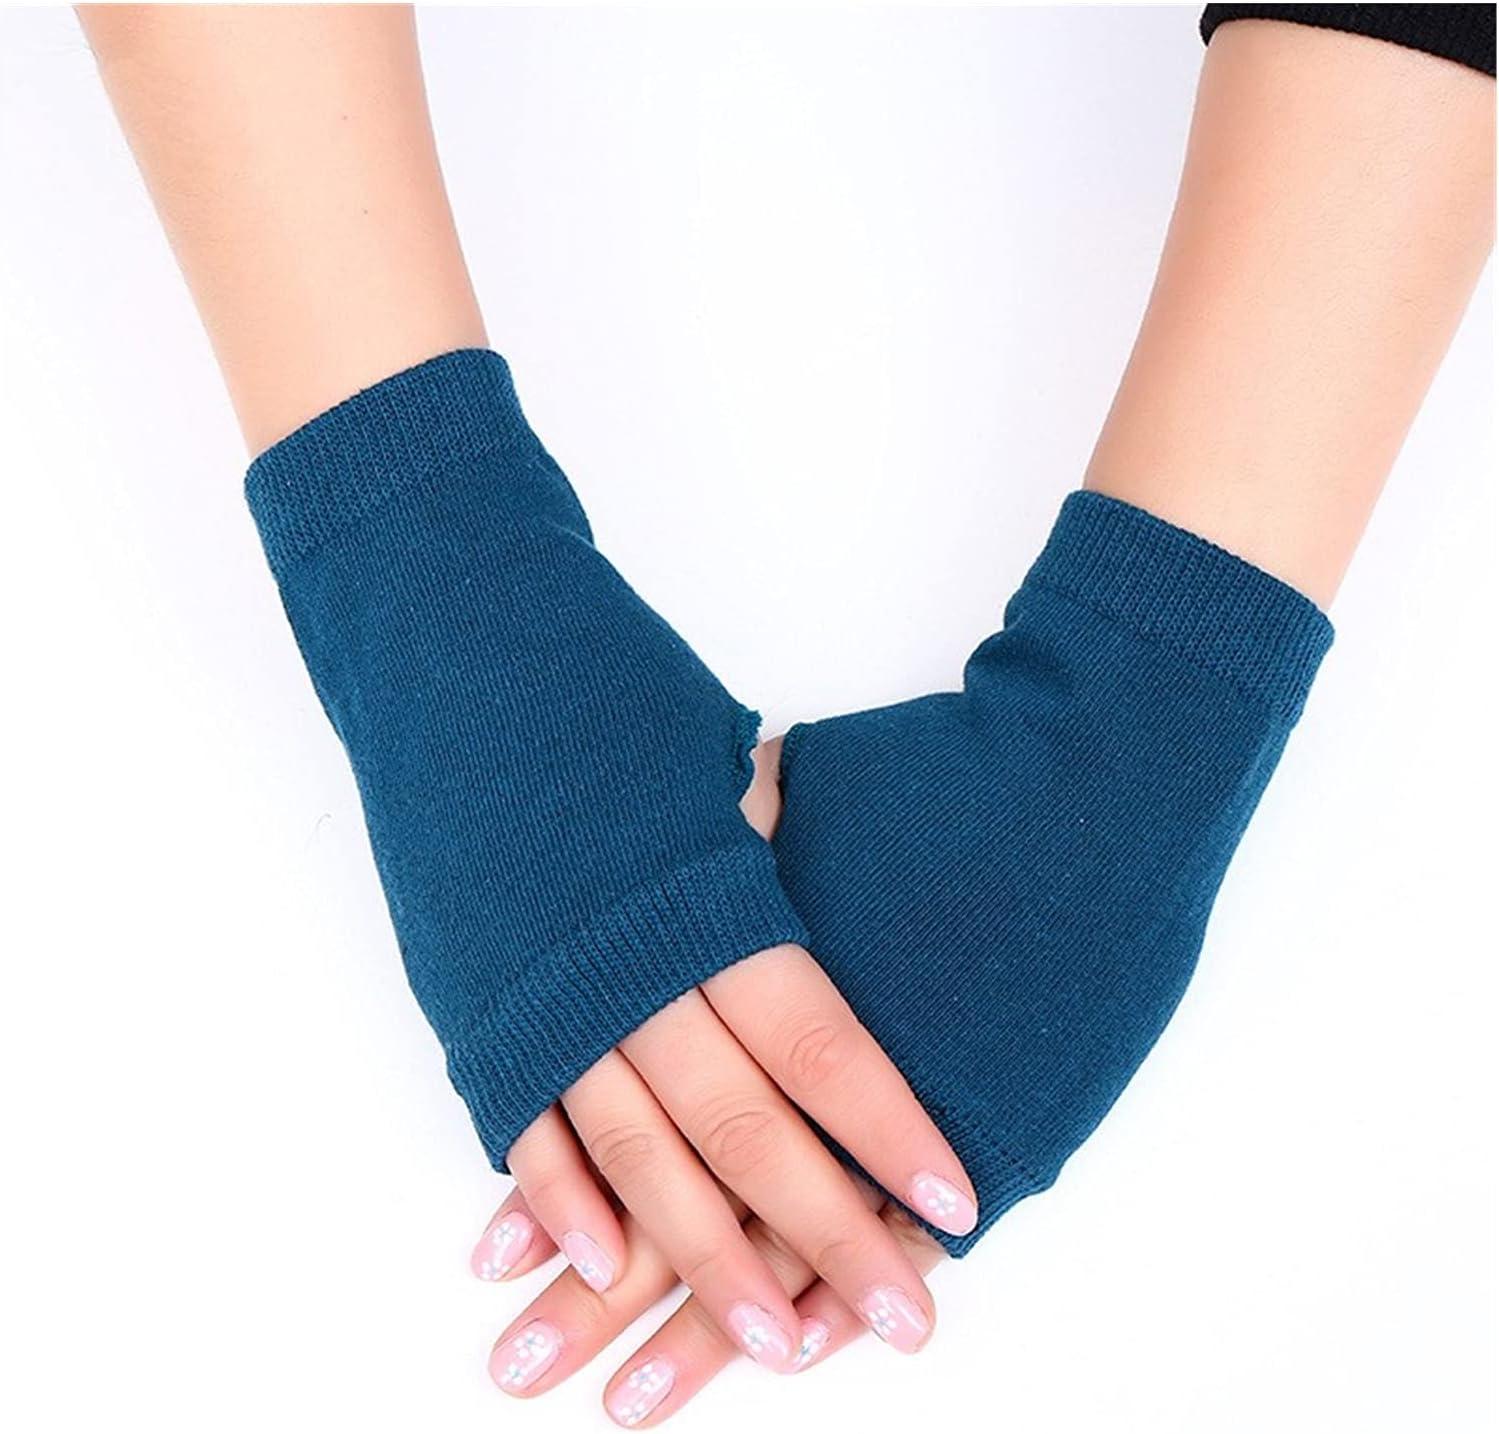 LDDJ Gloves 1 Pair Winter Gloves Female Fingerless Gloves Without Fingers Women Cashmere Warm Winter Gloves Hand Wrist Warmer Mittens Keep Warm (Color : Blue, Gloves Size : Free Size)